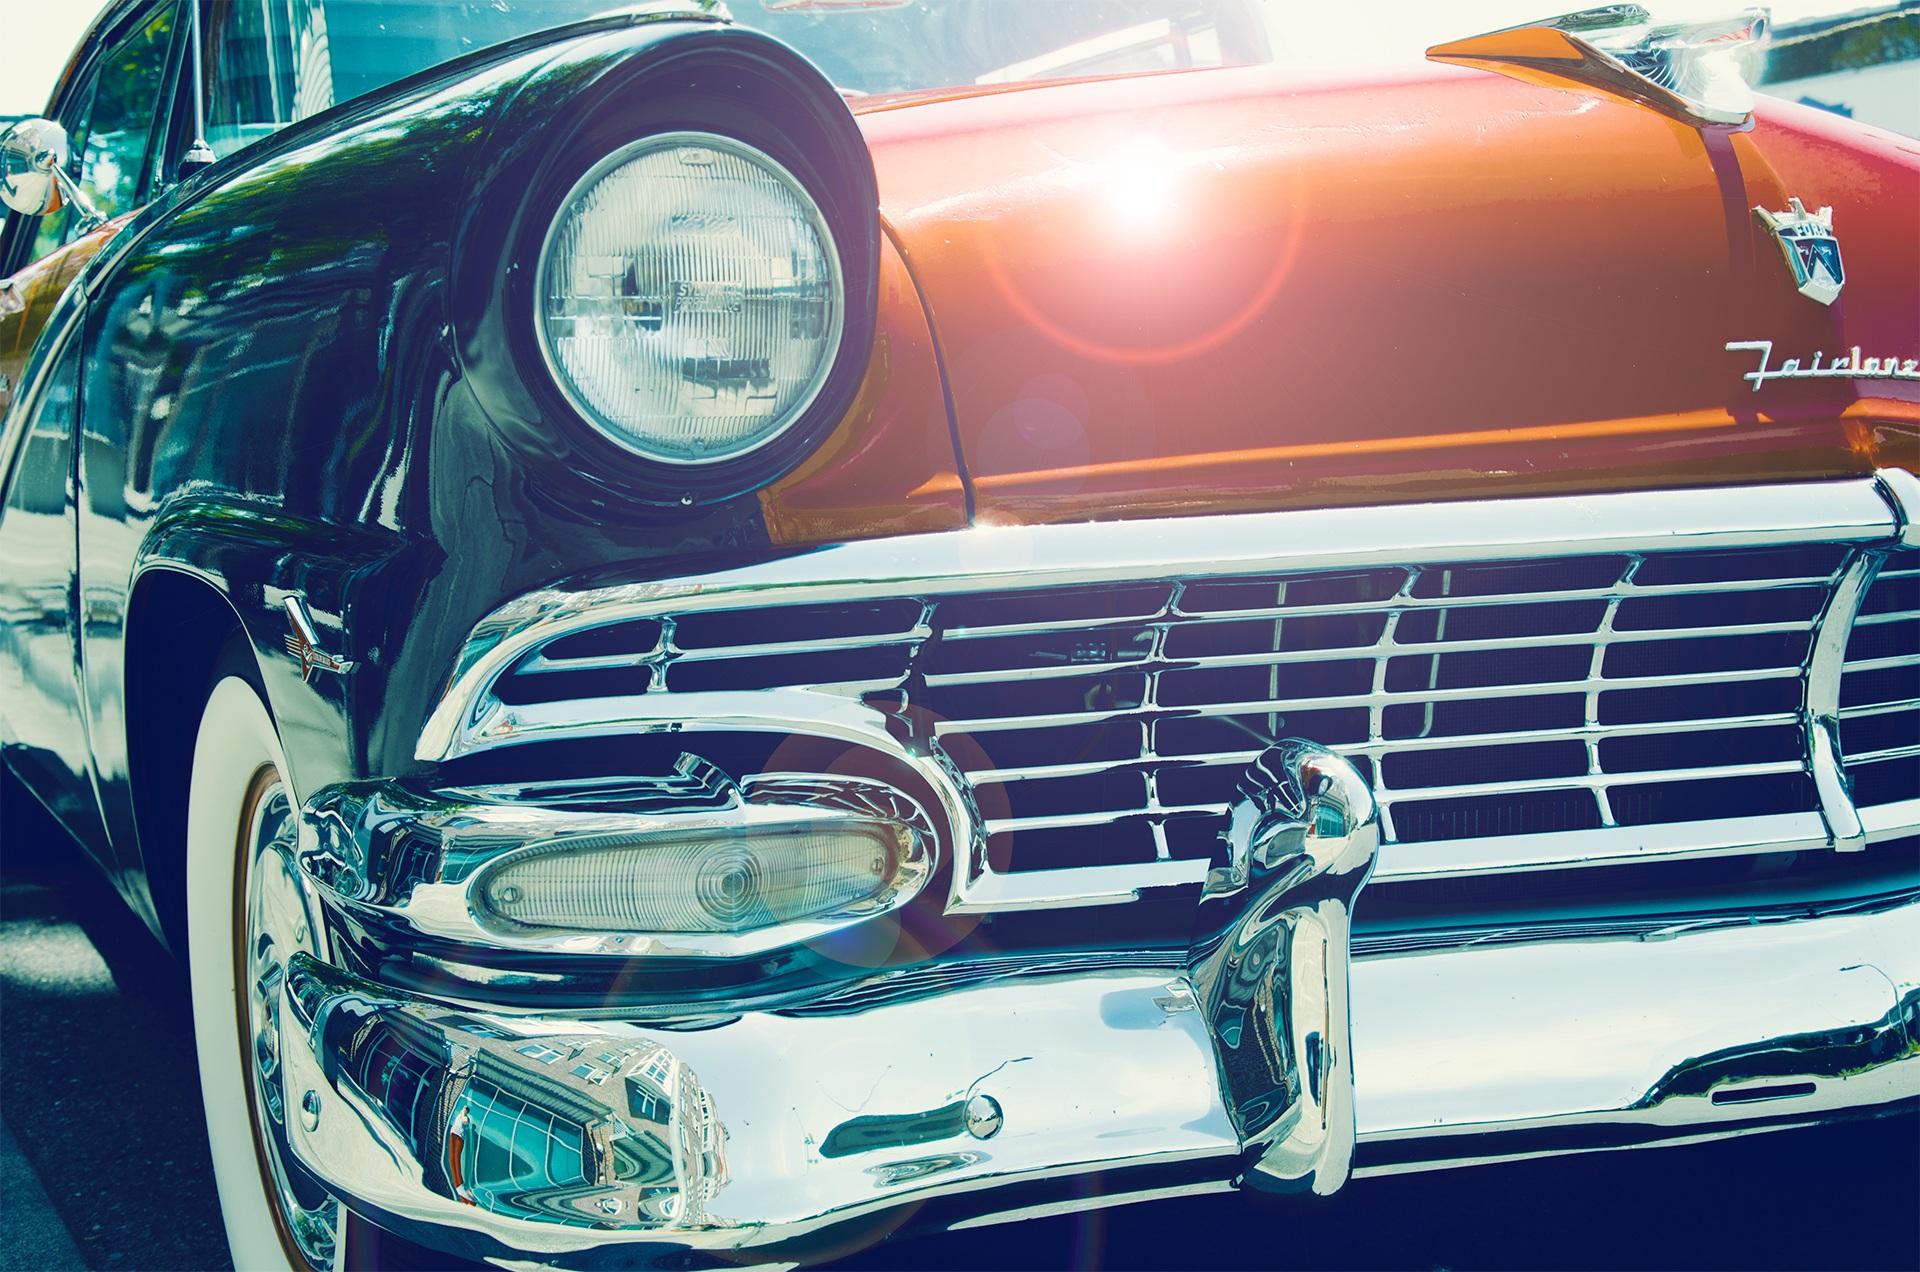 автомобиль, Старый, Классик, Винтаж, Форд - Обои HD - Профессор falken.com